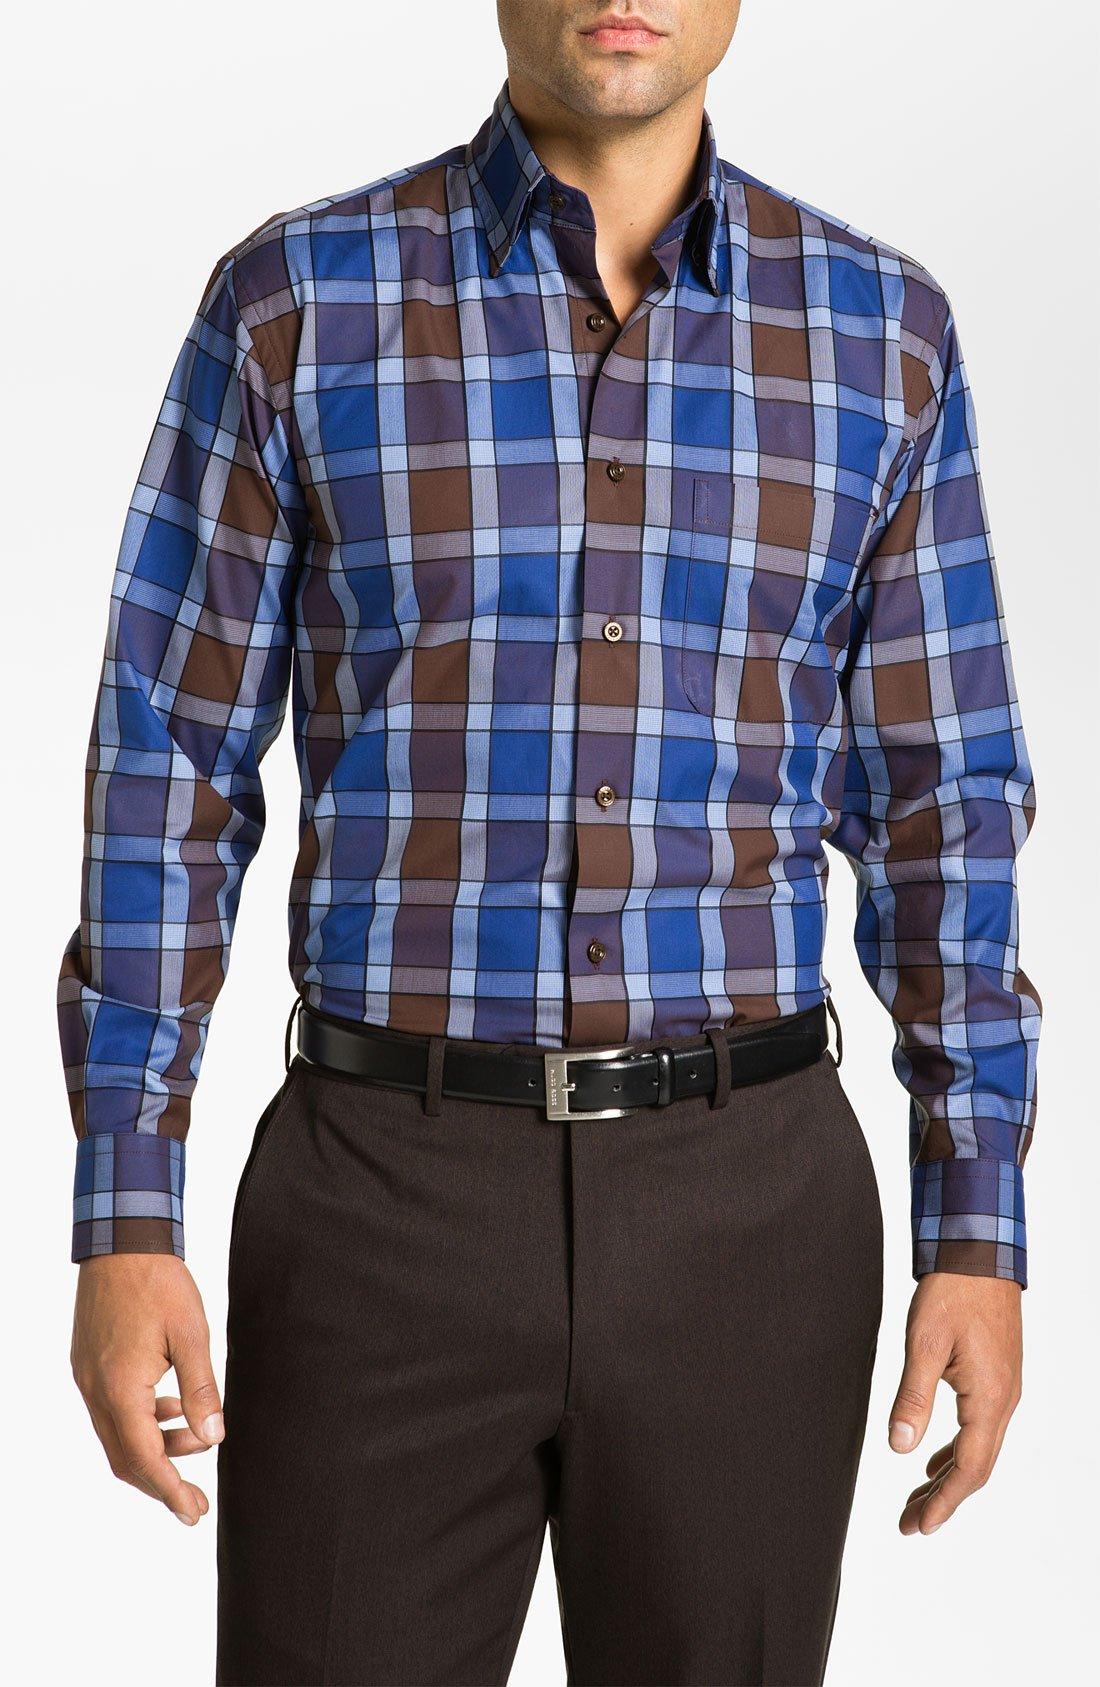 Robert talbott regular fit sport shirt in blue for men for Robert talbott shirts sale